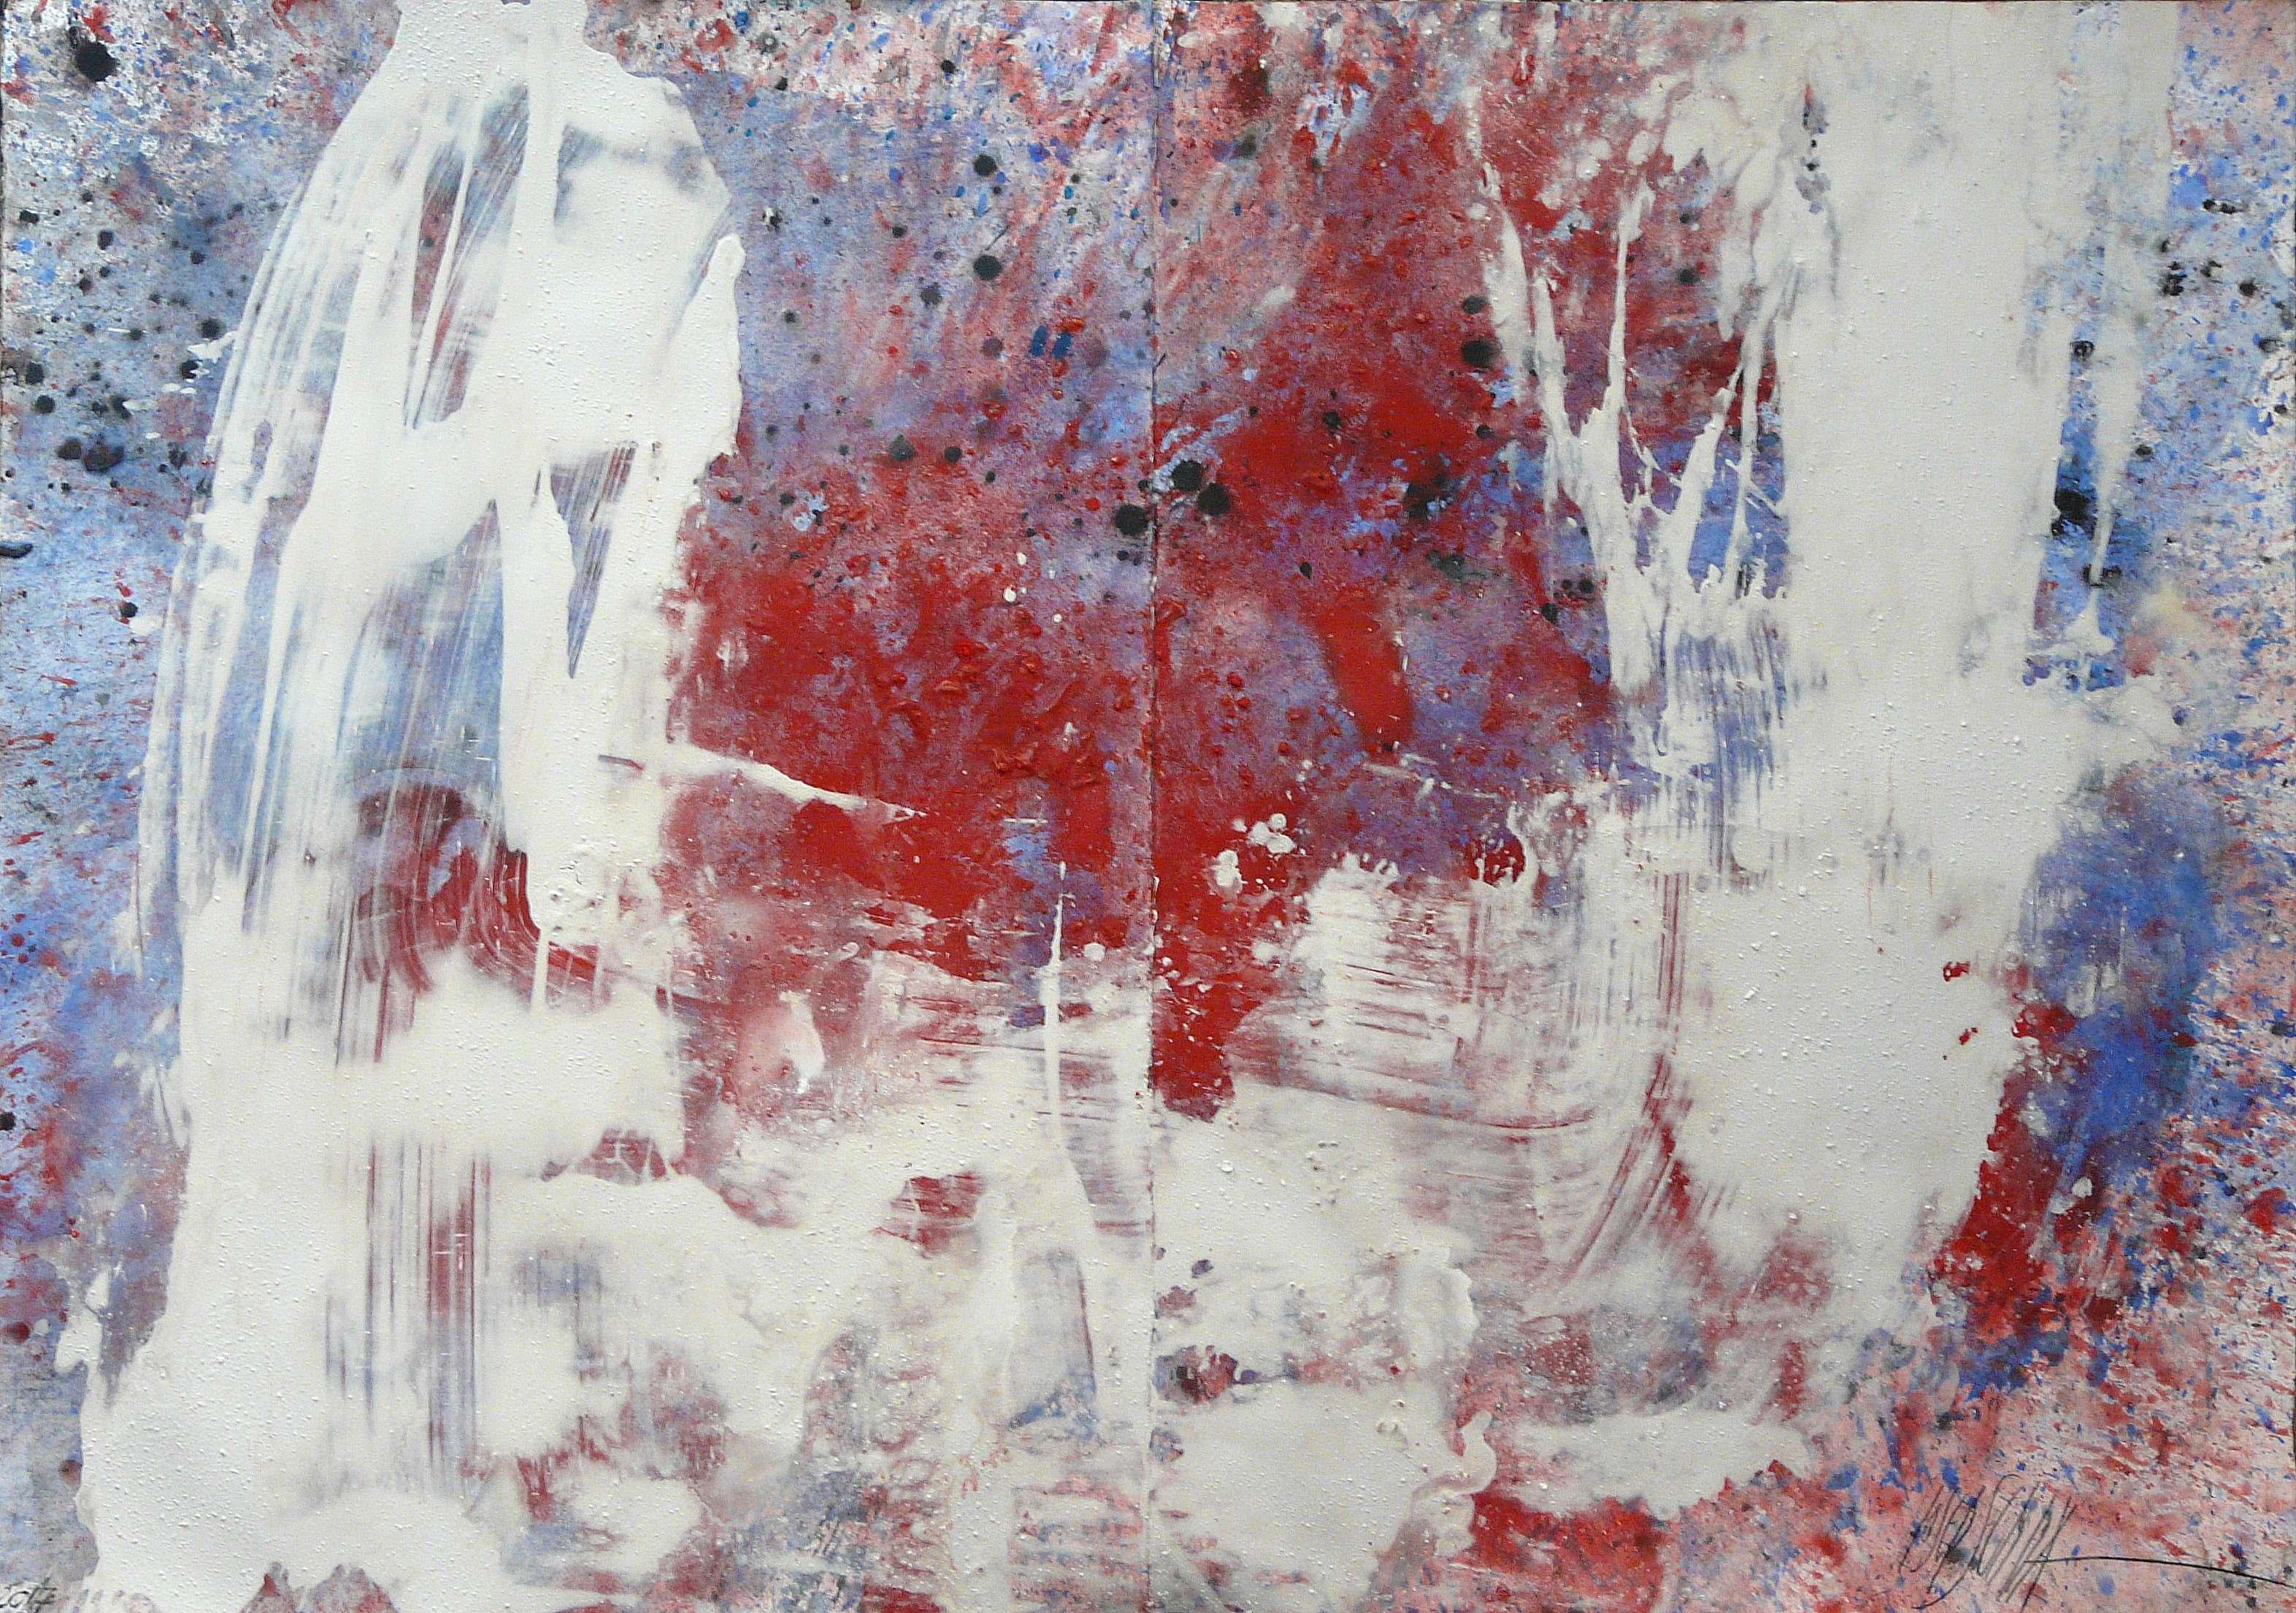 479 - Mixed technique on paper 100 x 141 cm 2017